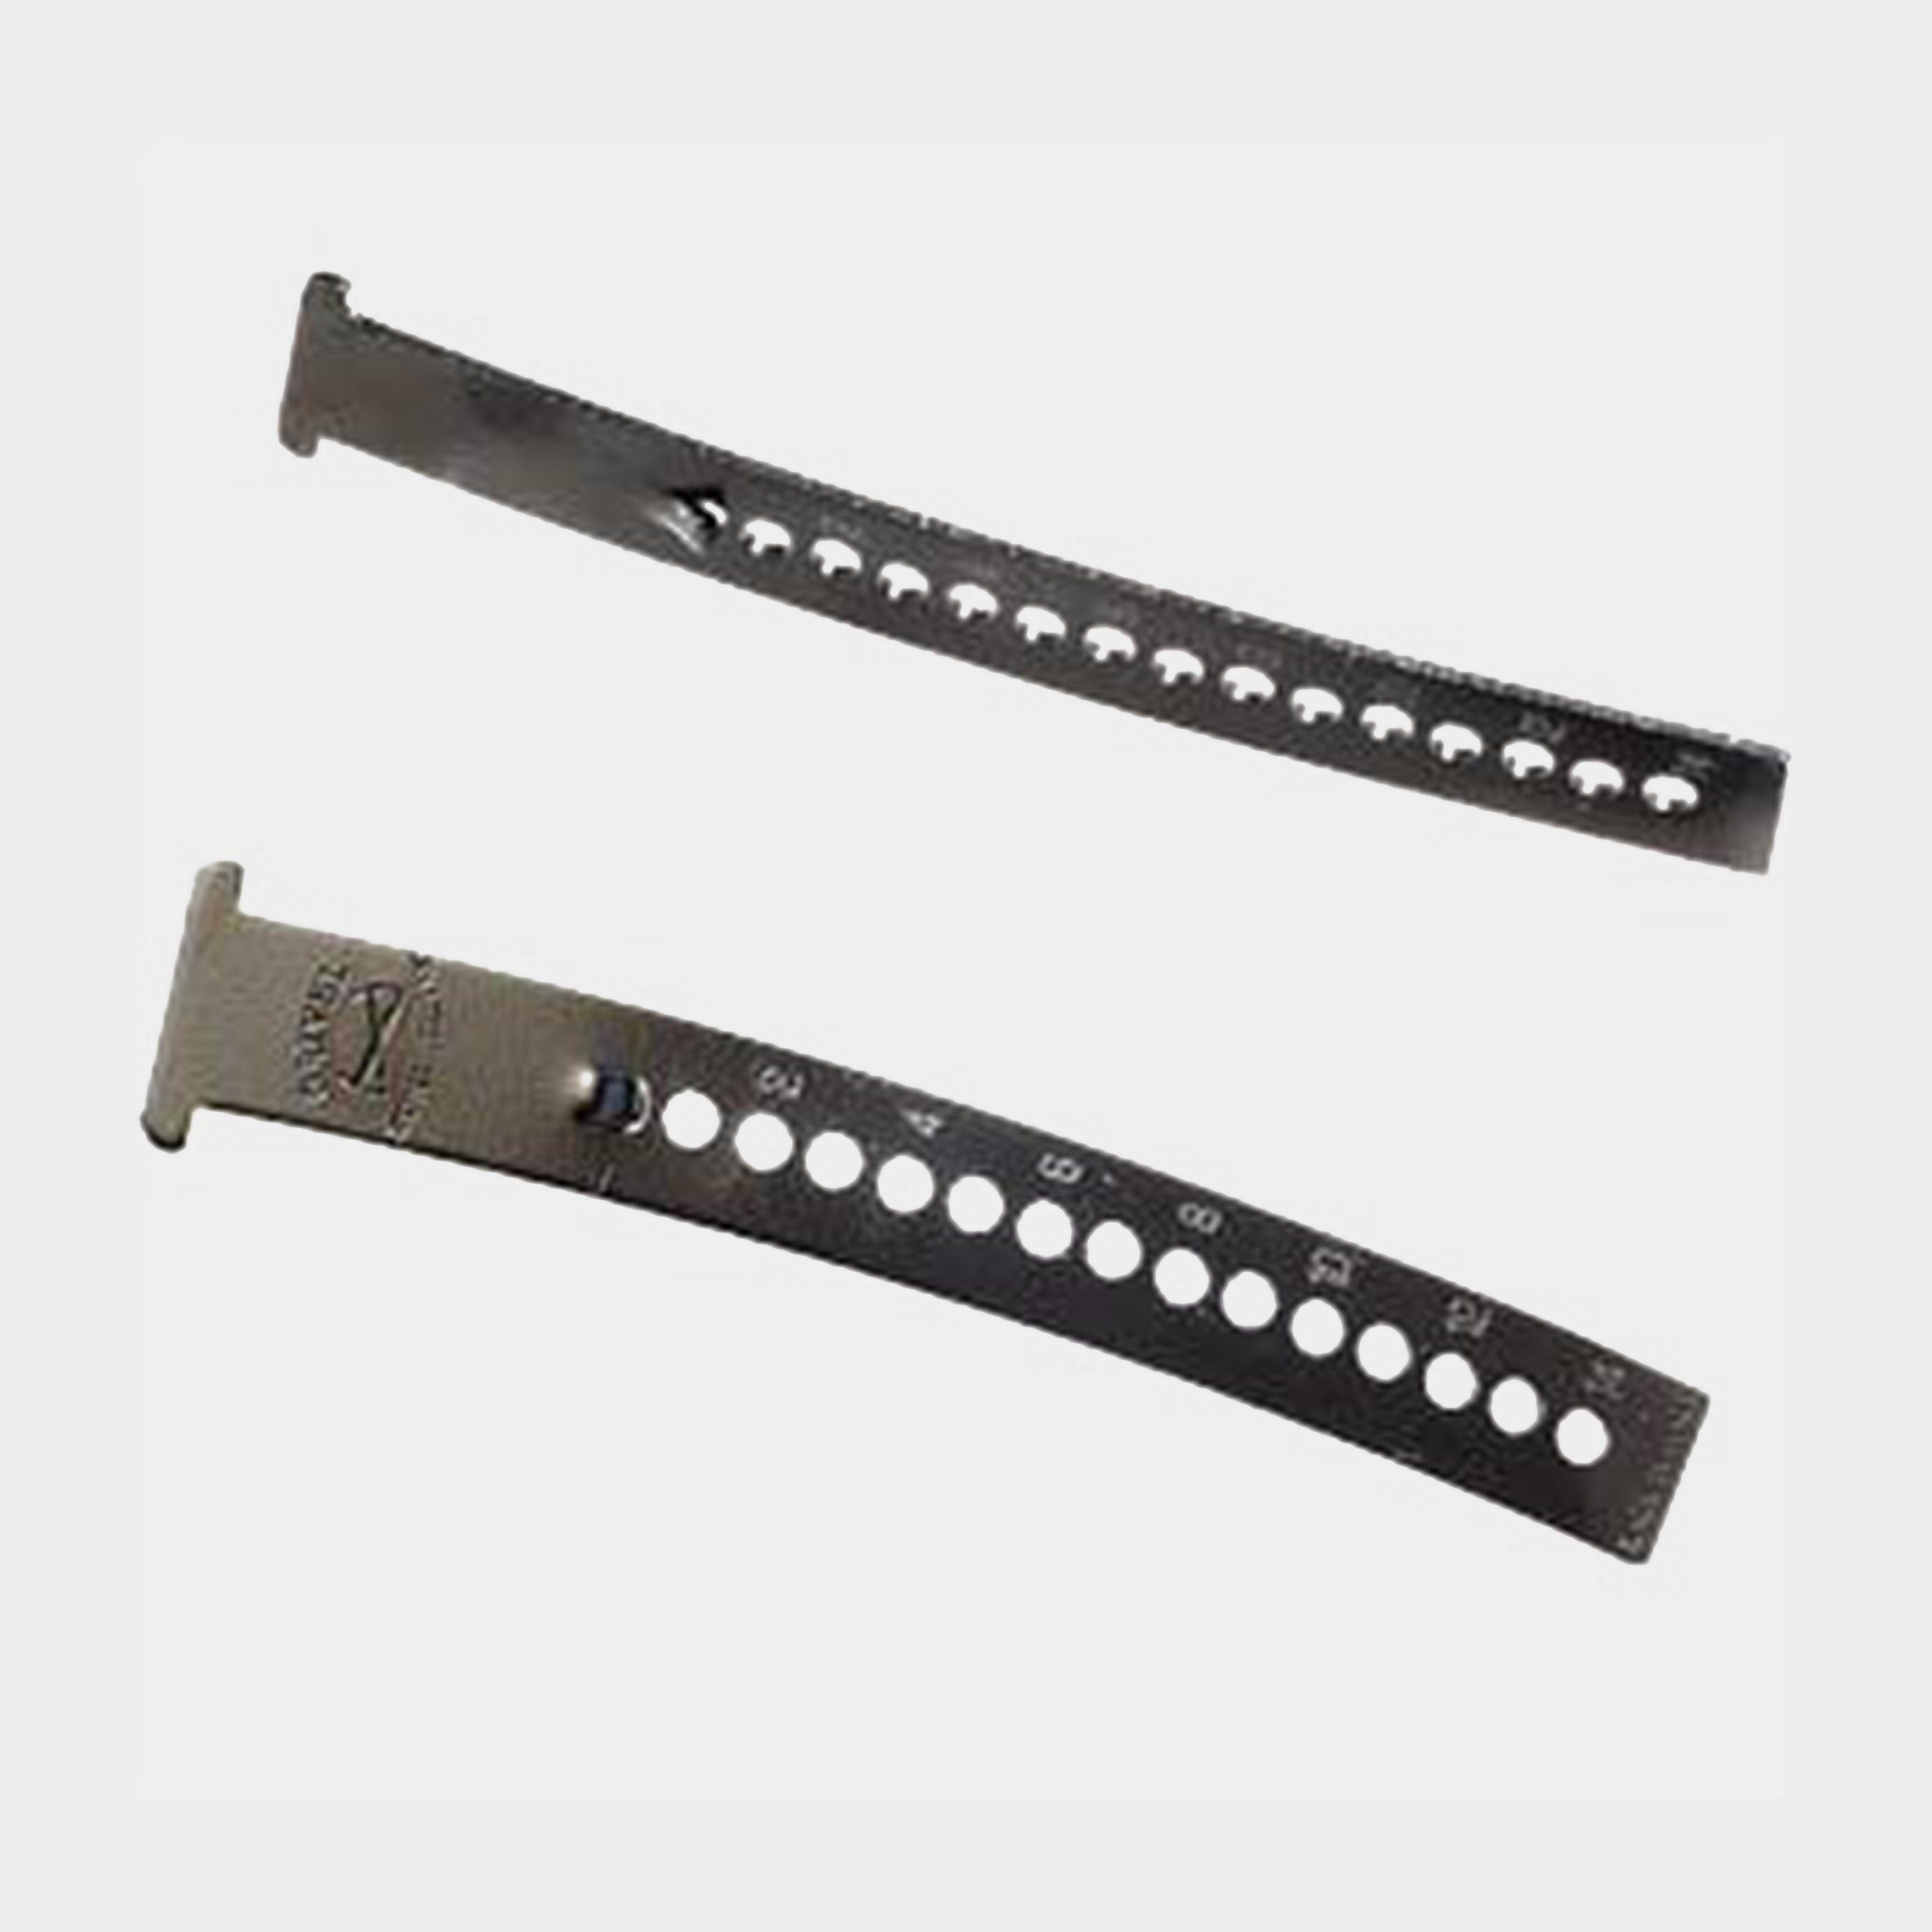 GRIVEL Long Crampon Extension Bar 190mm